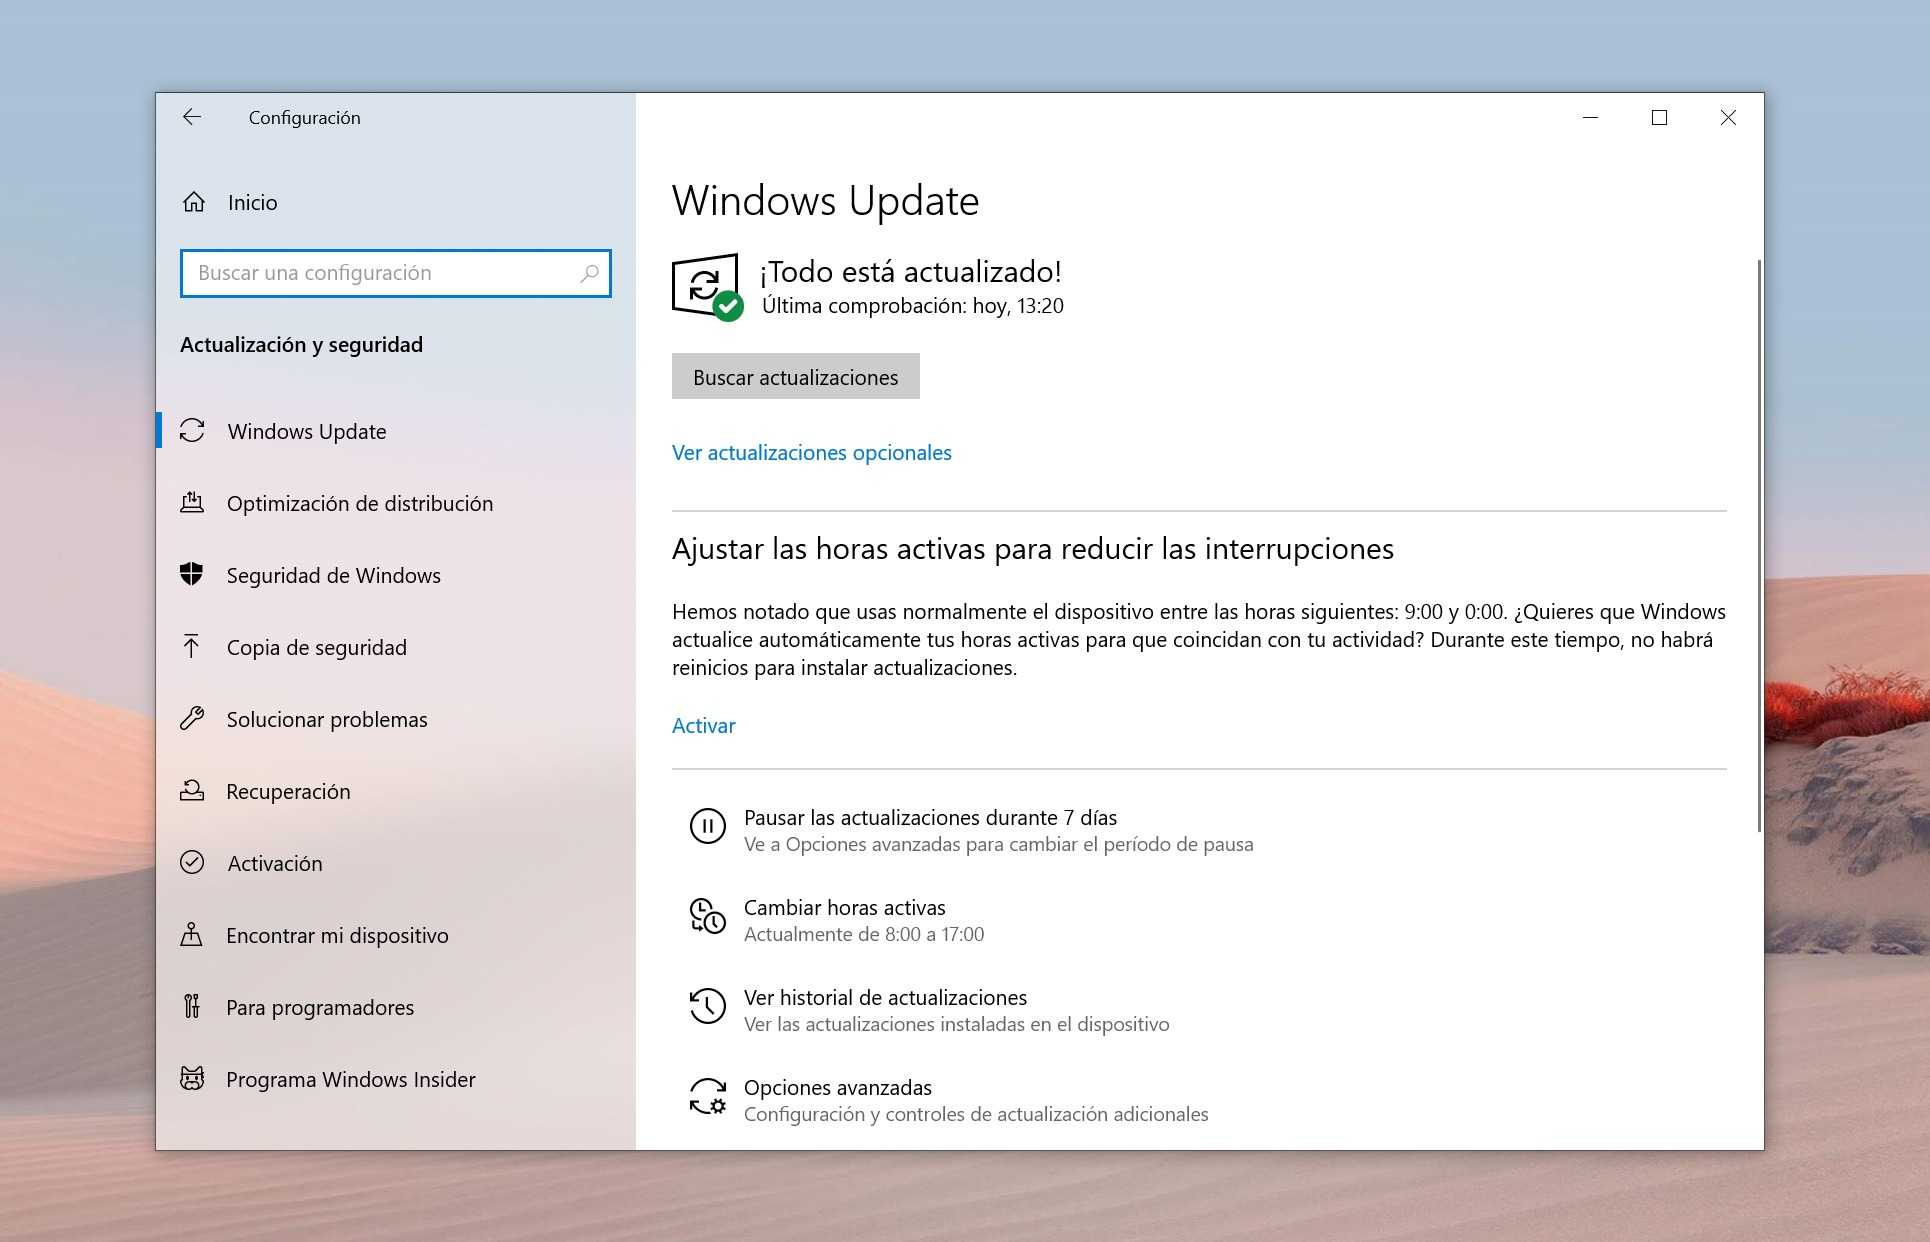 Windows Update dans Windows 10